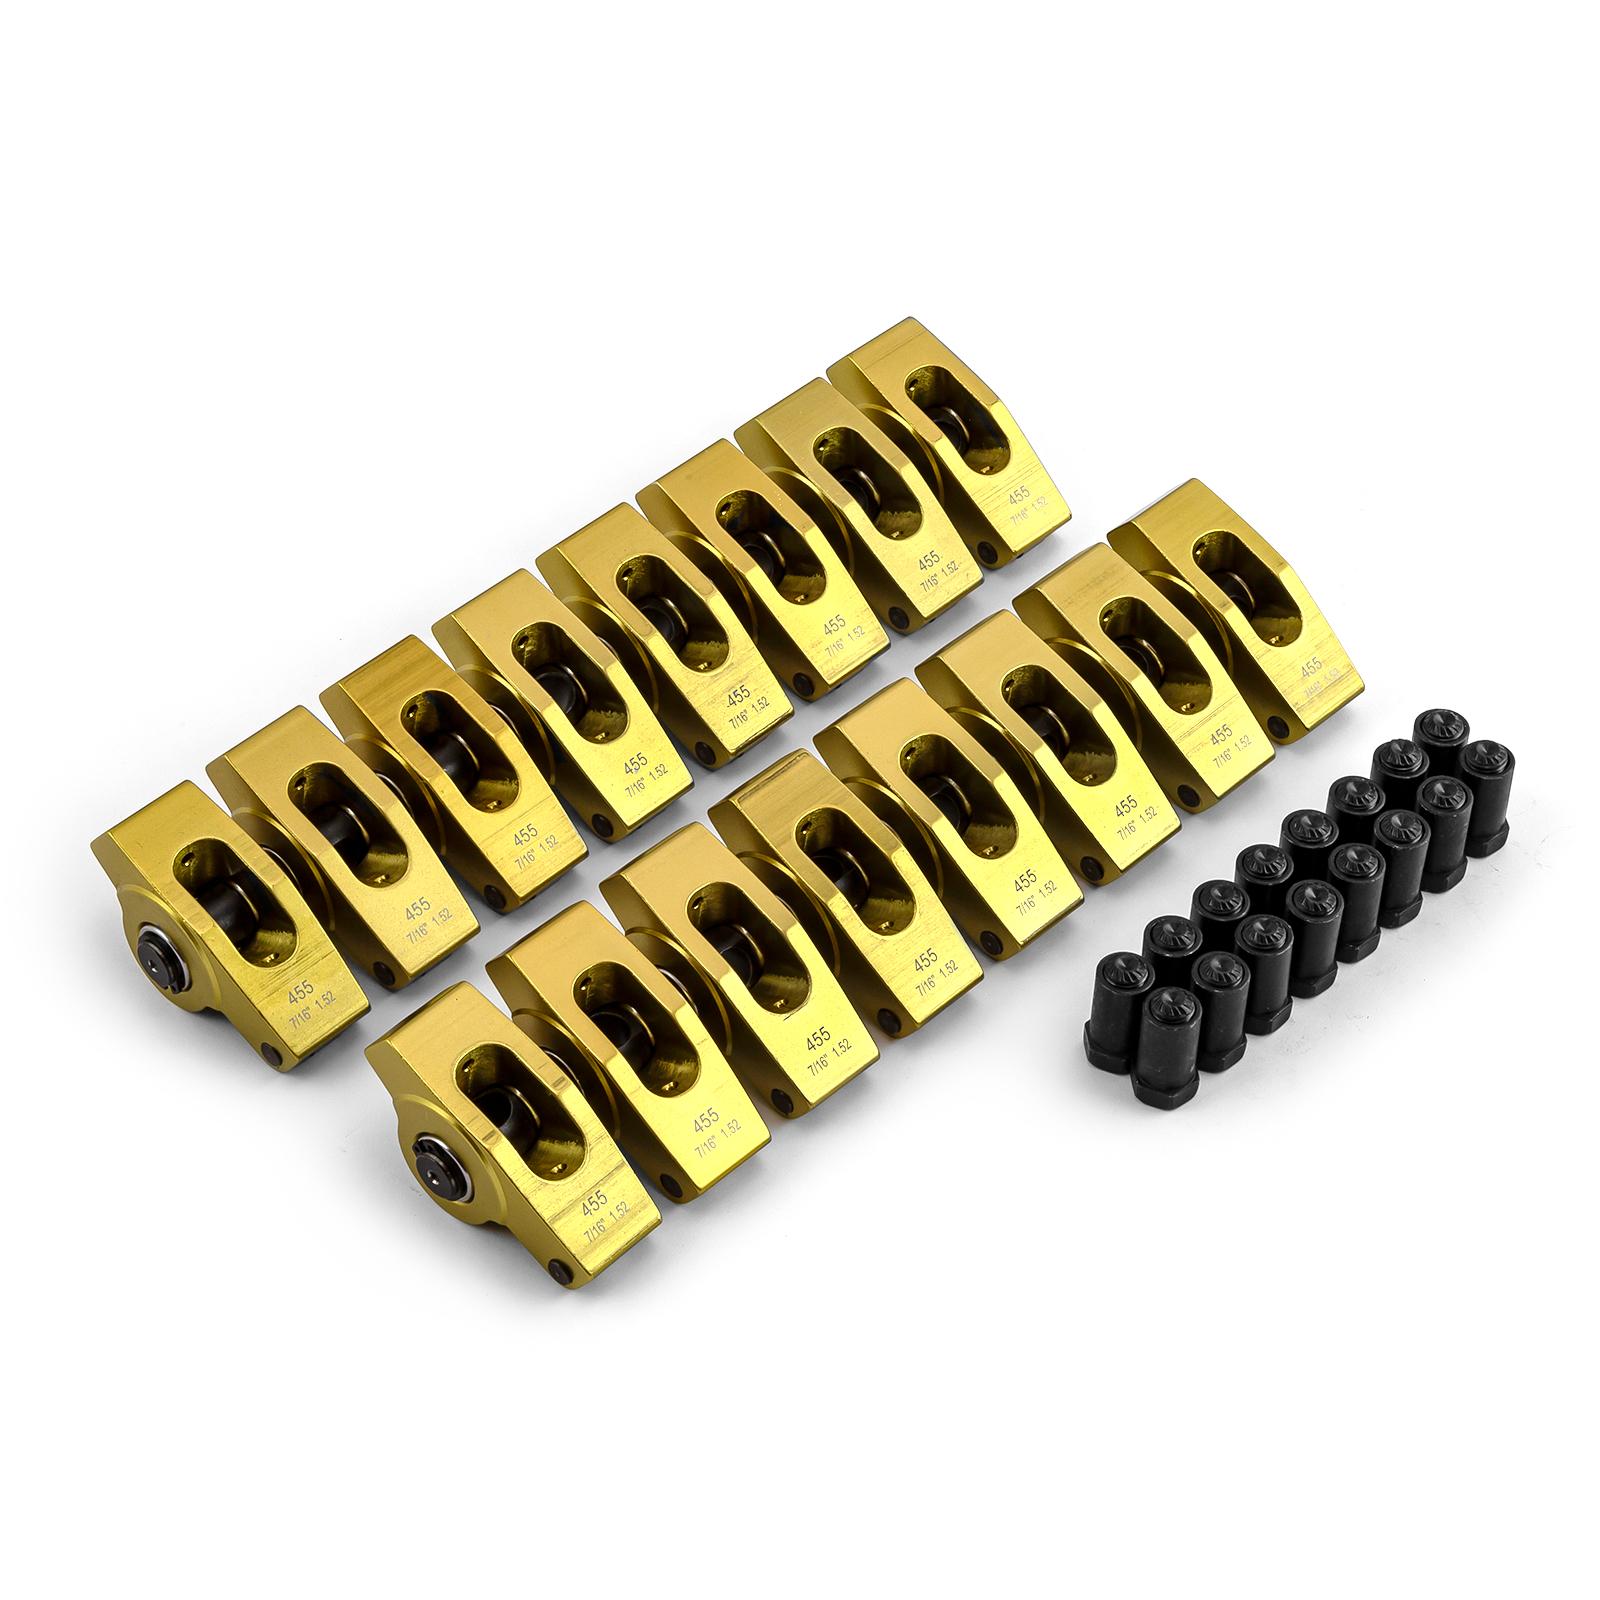 "Pontiac 265 350 400 455 1.52 Ratio 7/16"" Aluminum Roller Rocker Arms"